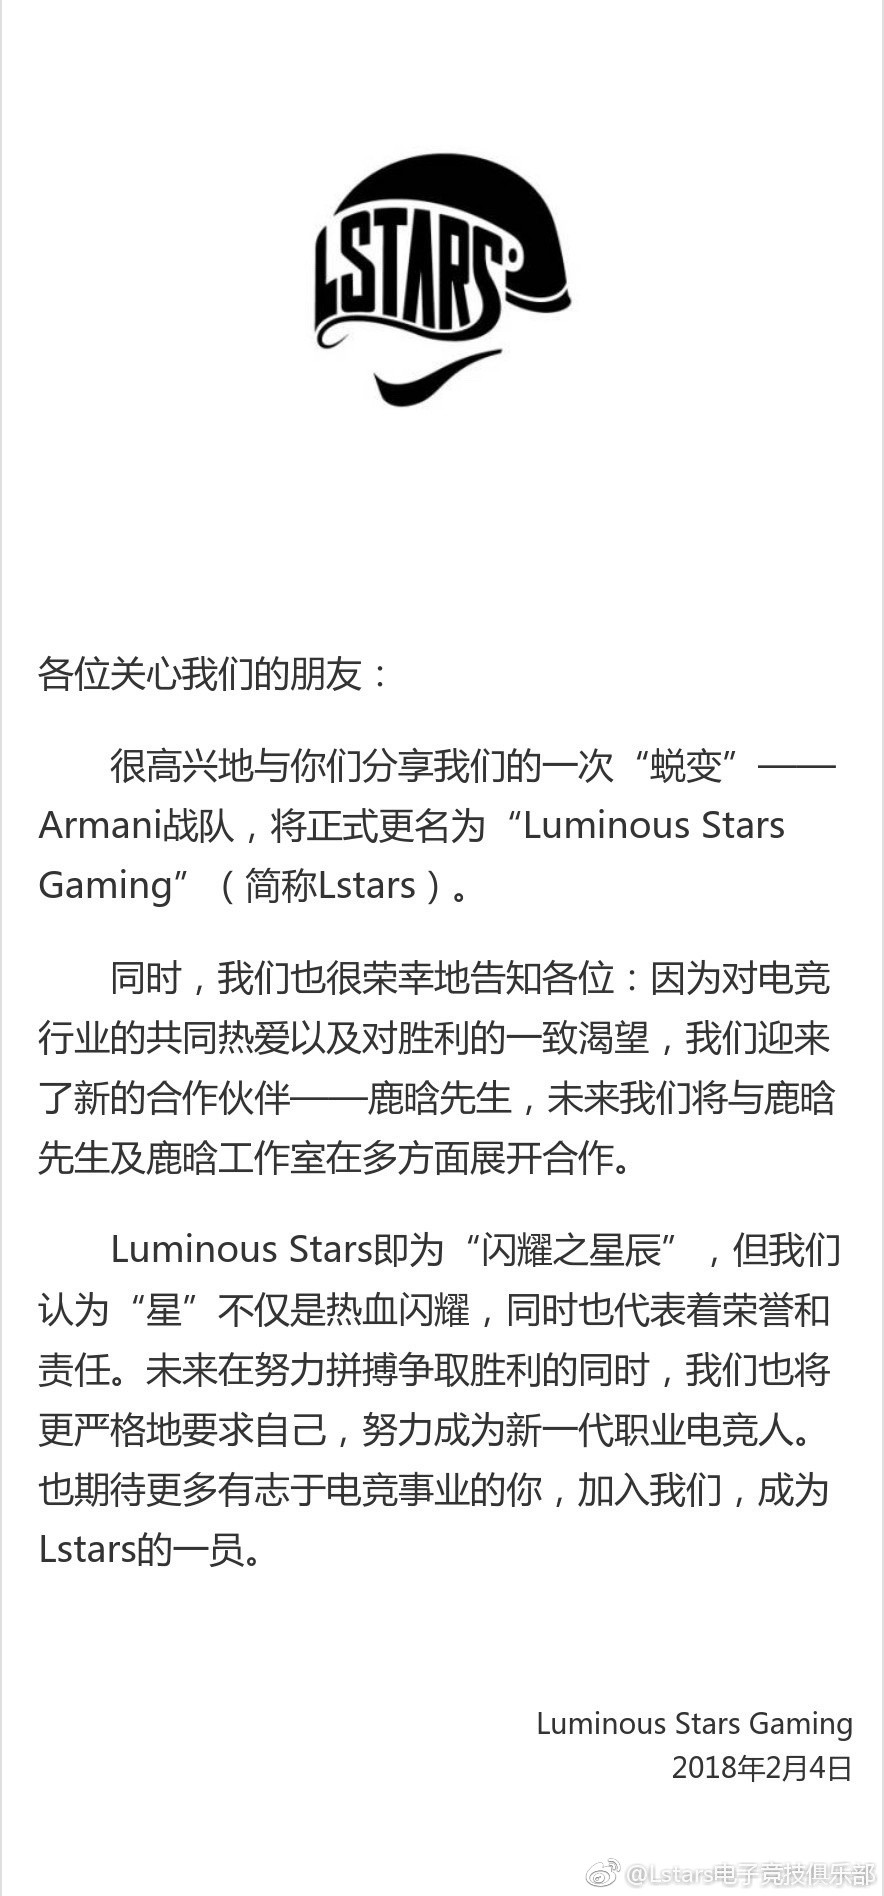 ▲Lstars電子競技俱樂部宣布和鹿晗合作。(圖/翻攝自Lstars電子競技俱樂部微博)